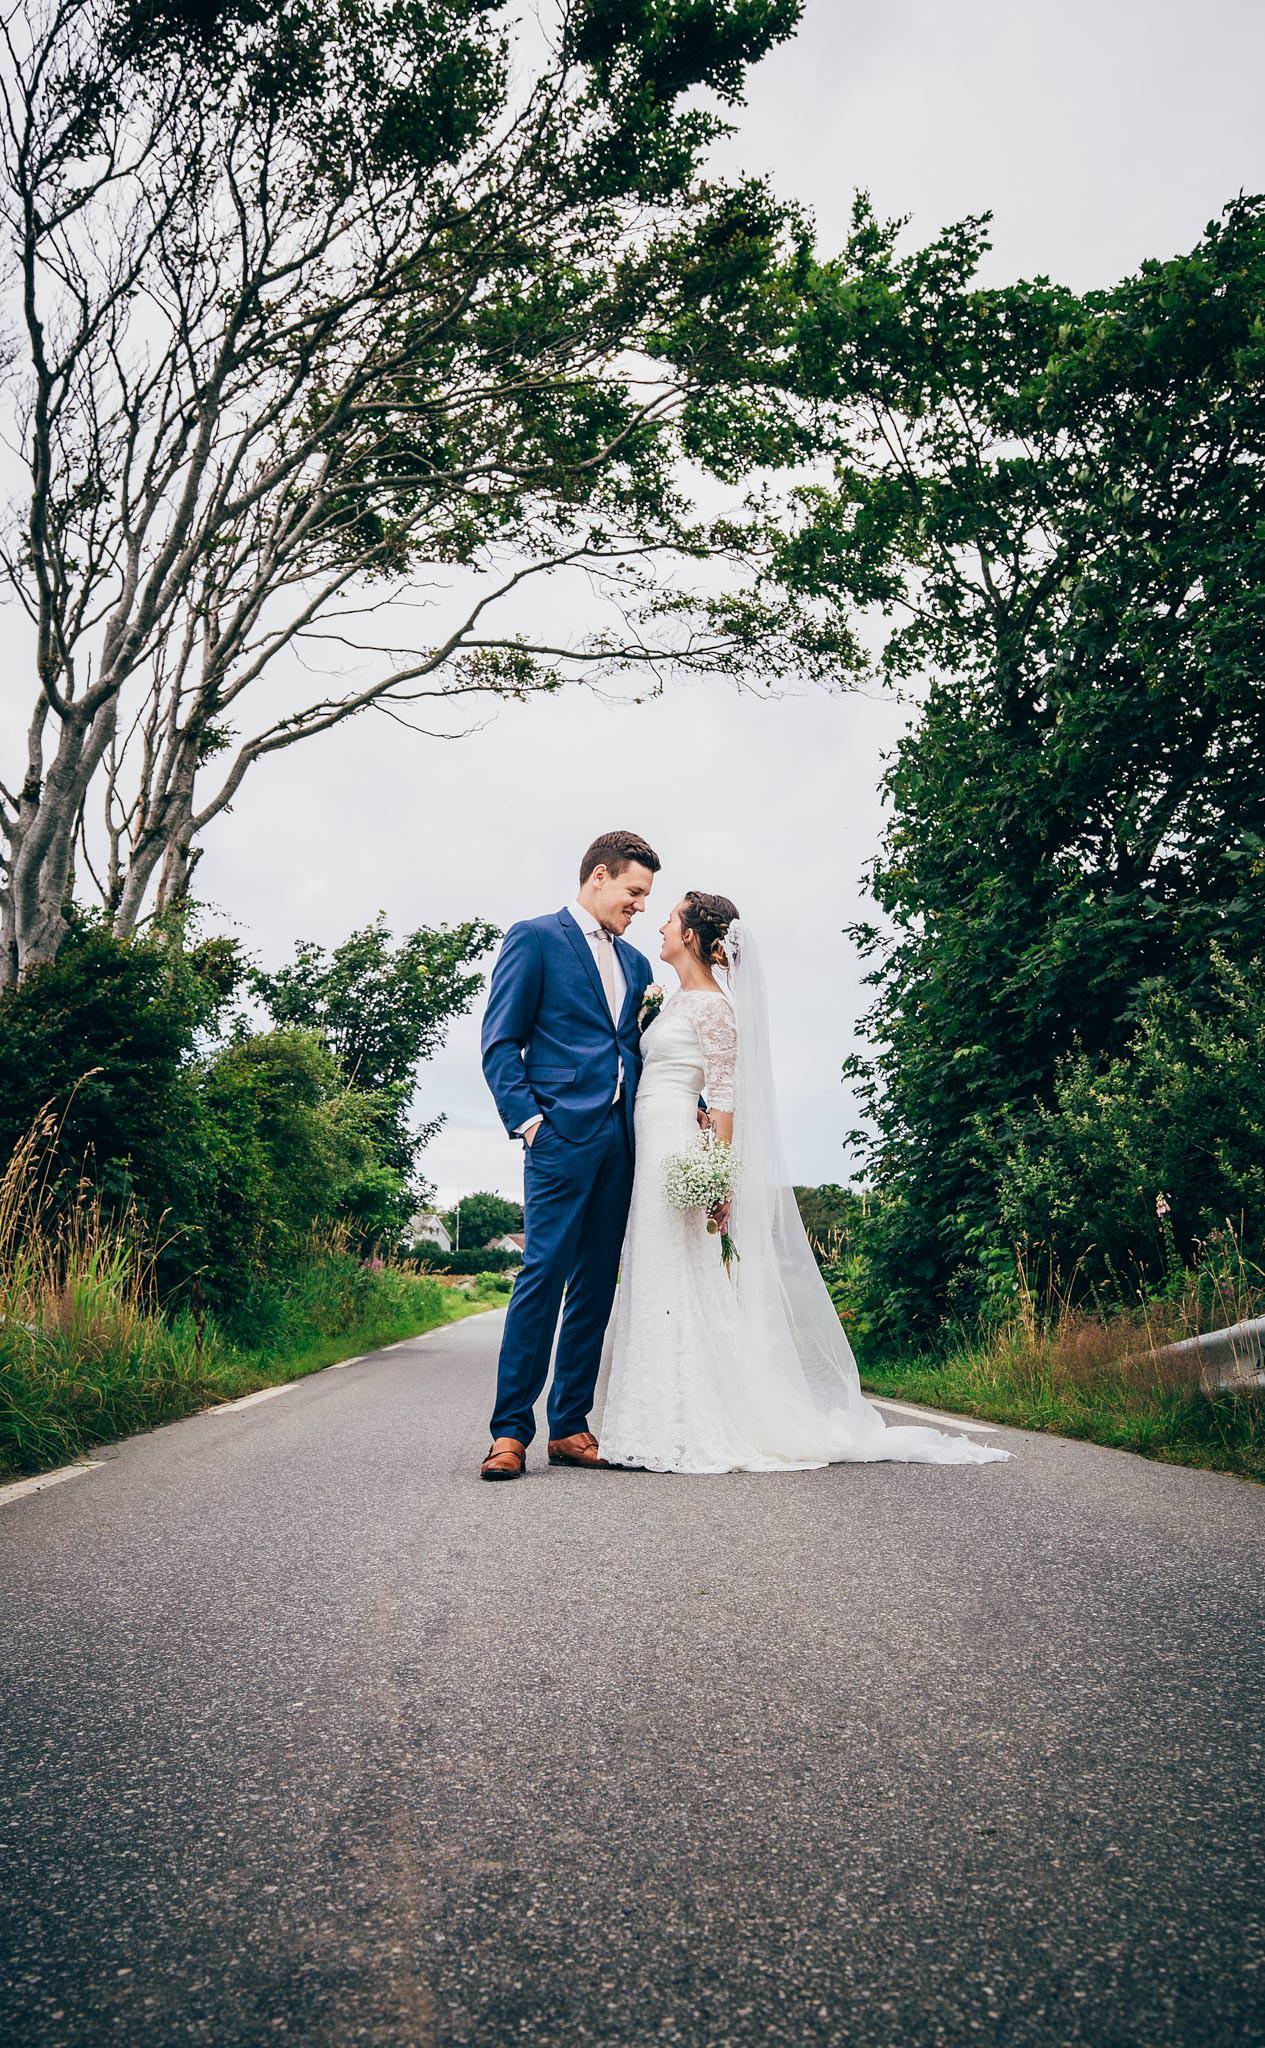 Norway+wedding+photographer+elopement+pre+wedding+Casey+Arneson-72.jpg